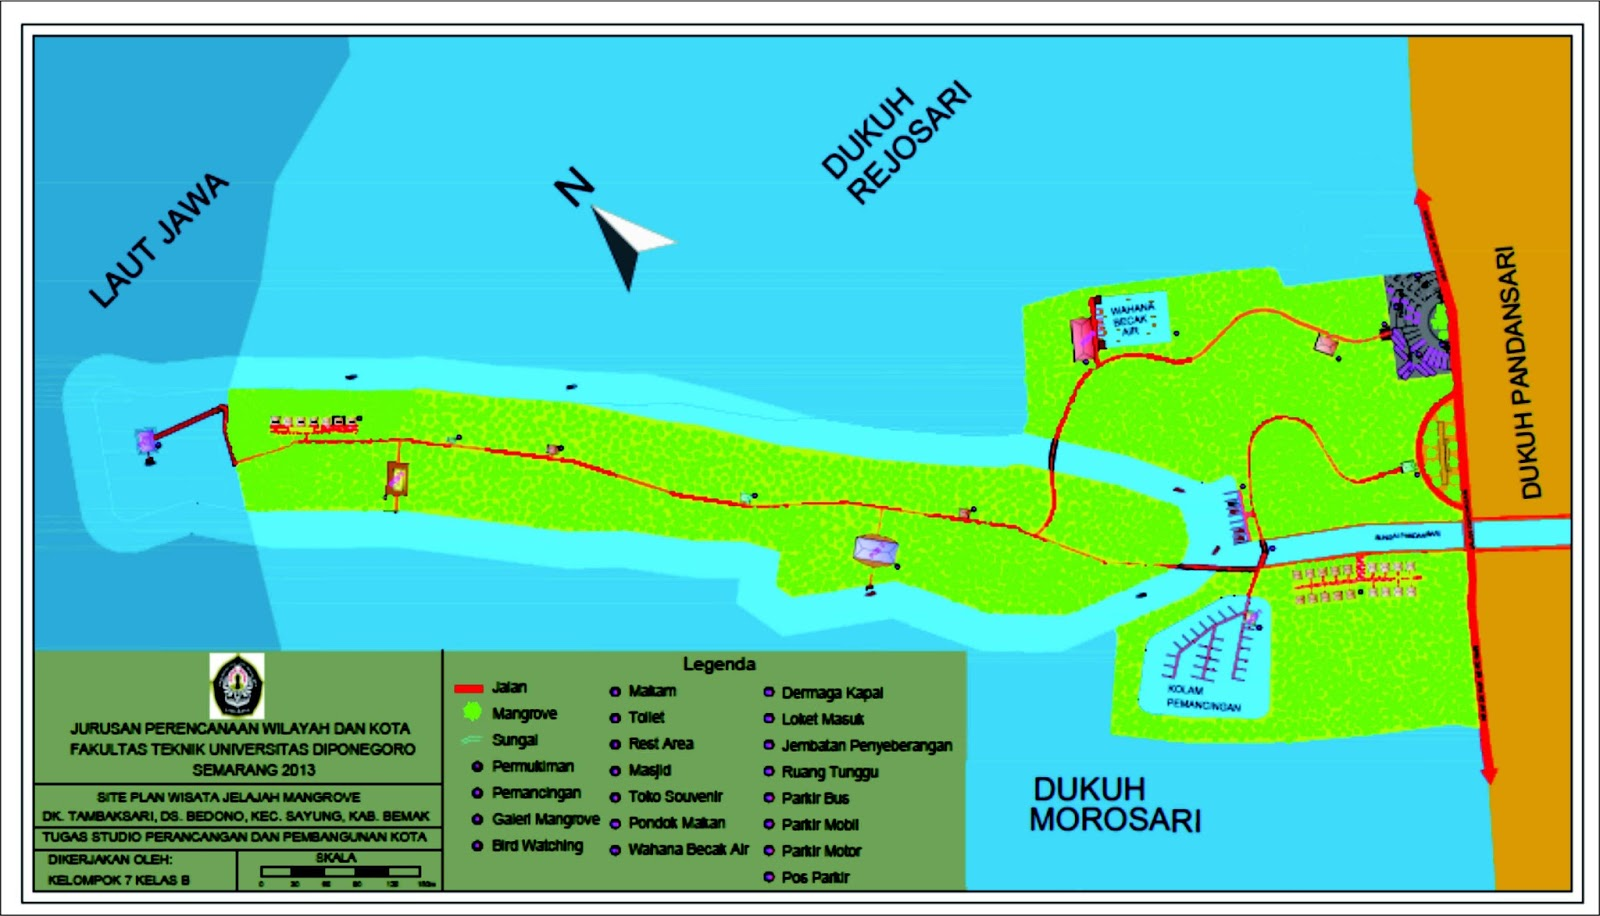 medium resolution of selain itu juga merupakan bentuk visualisai konsep wisata jelajah mangrove dalam bentuk 3d